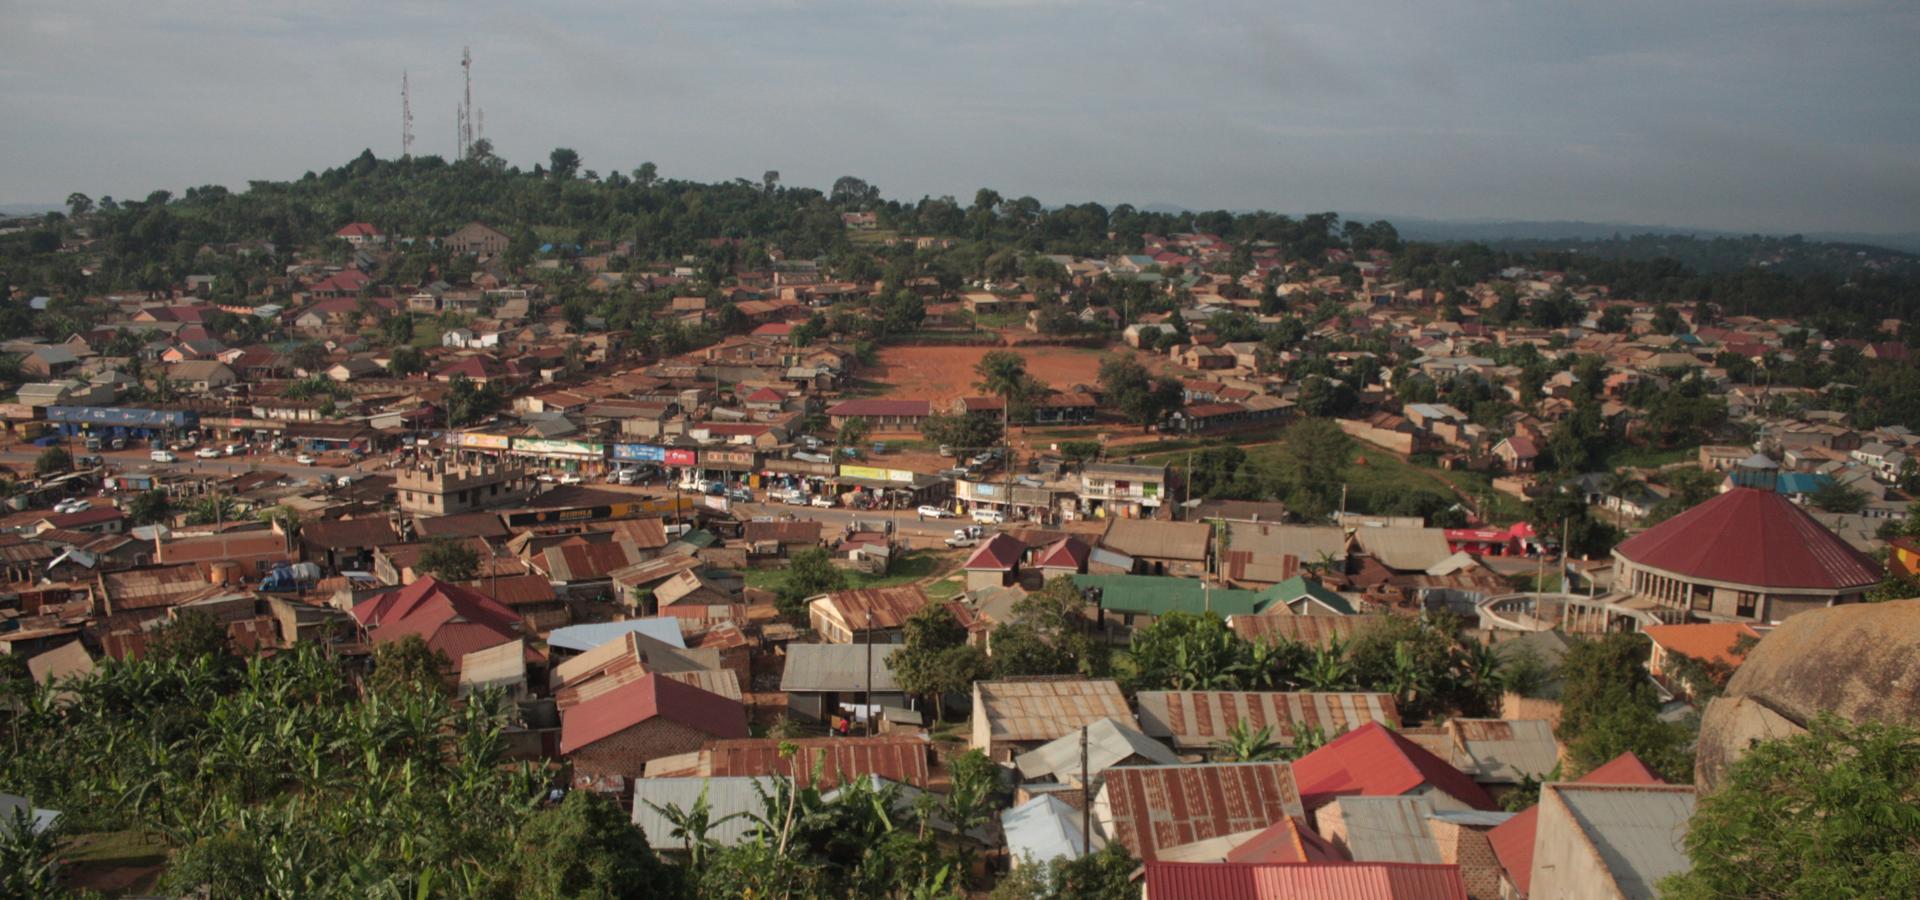 Peer-to-peer advisory in Mombasa, Uganda.